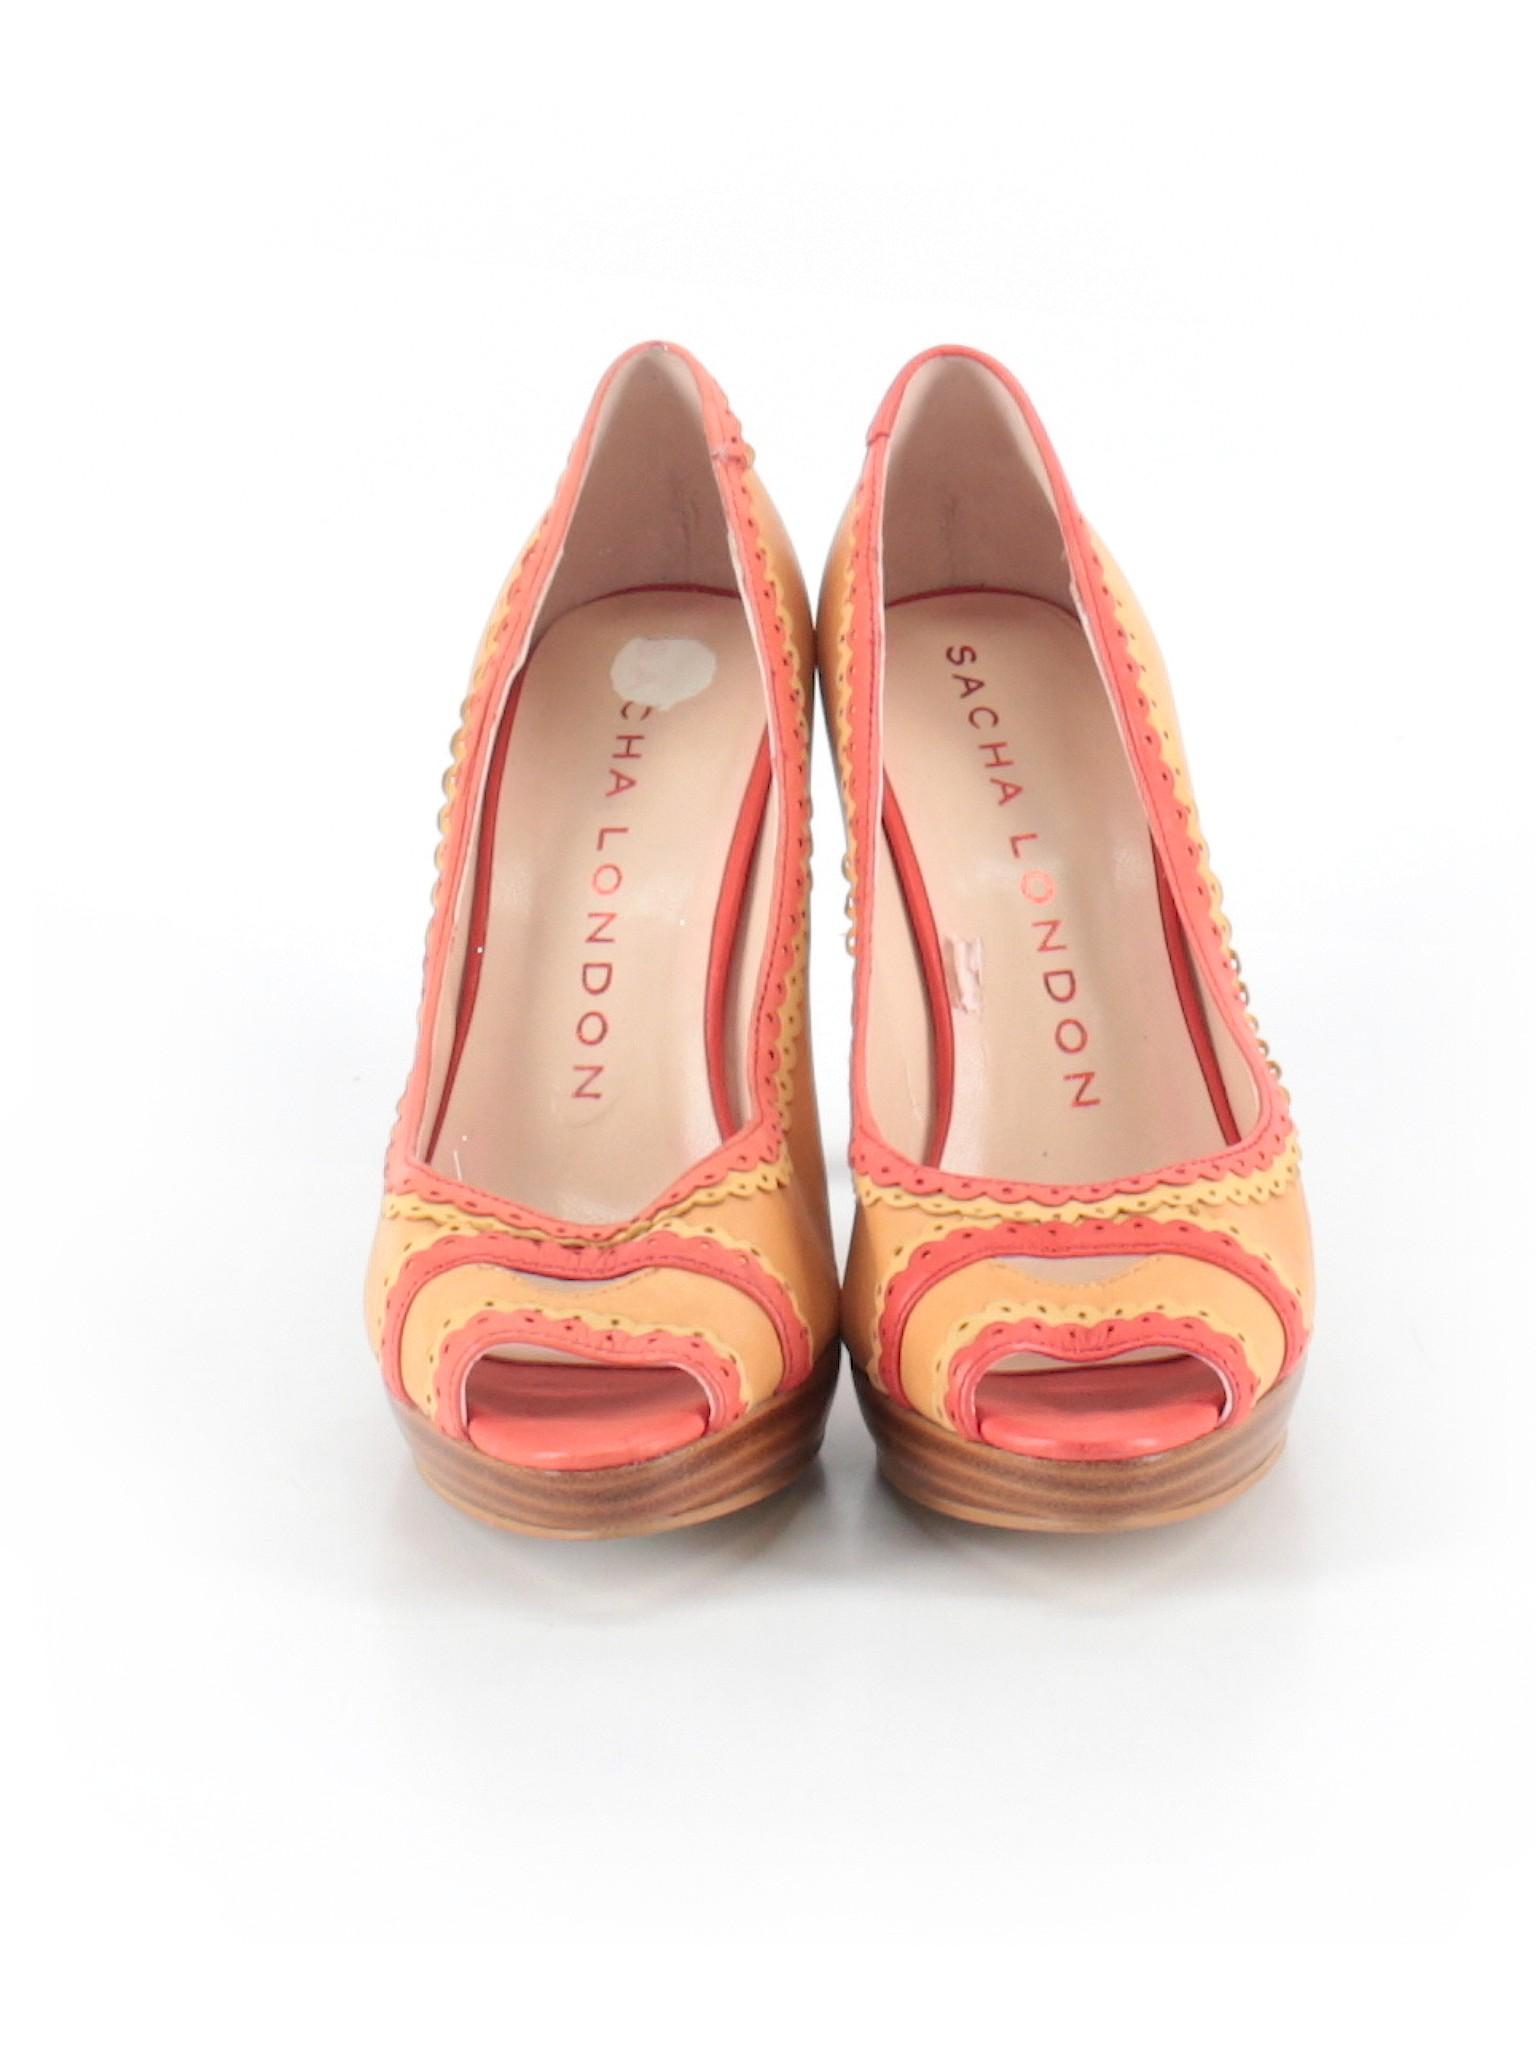 London Sacha London promotion Sacha Boutique Heels Heels Boutique promotion 6WZ15wHq